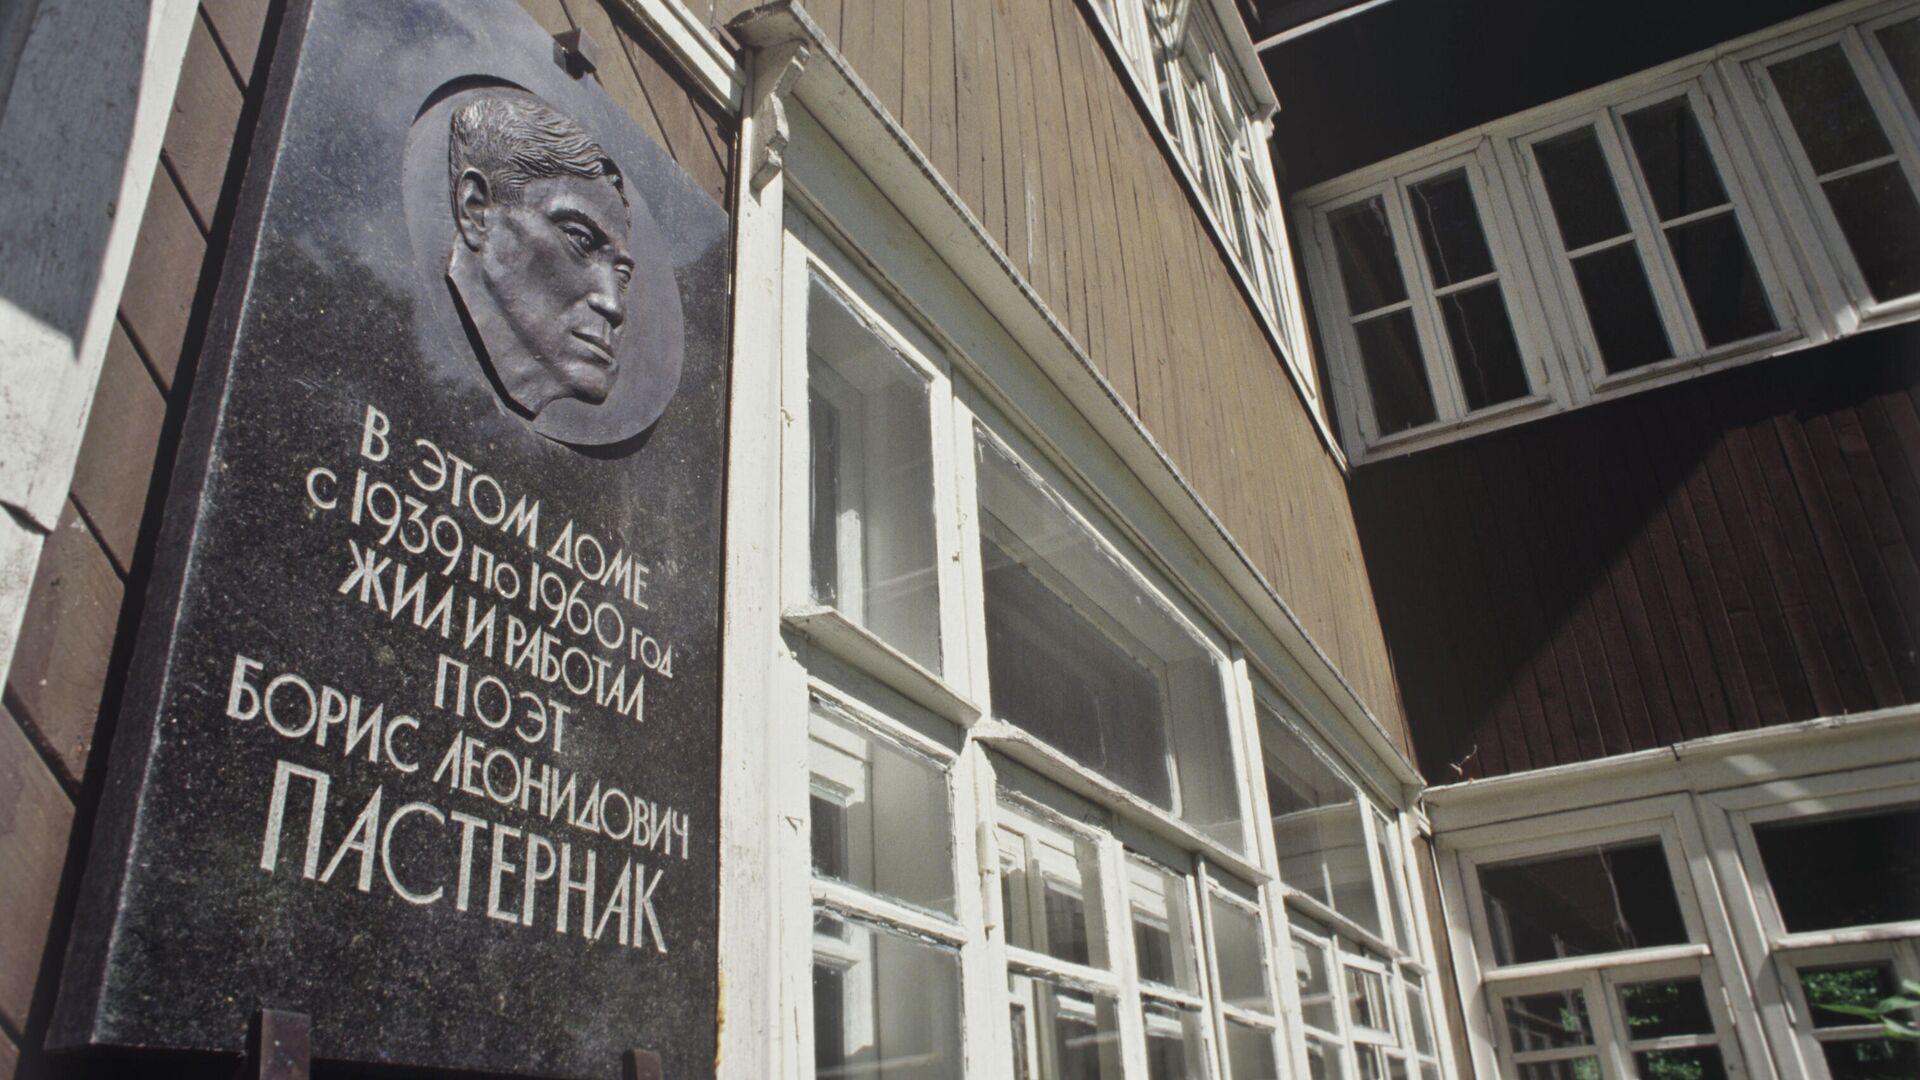 Дом-музей Бориса Леонидовича Пастернака - РИА Новости, 1920, 22.05.2020